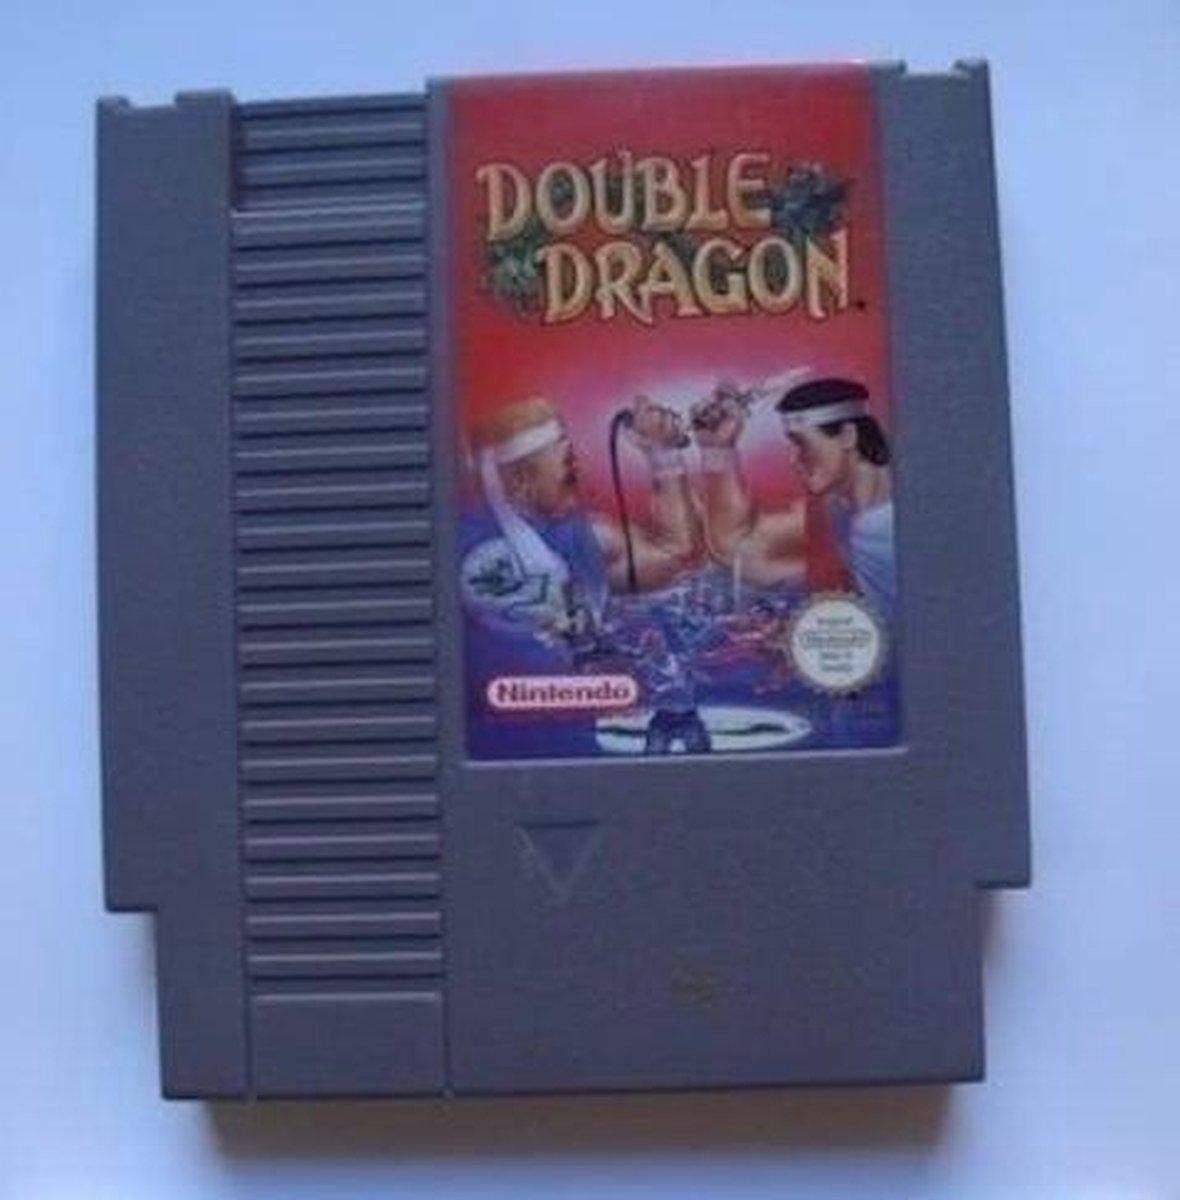 Double Dragon - Nintendo [NES] Game [PAL] - Nintendo